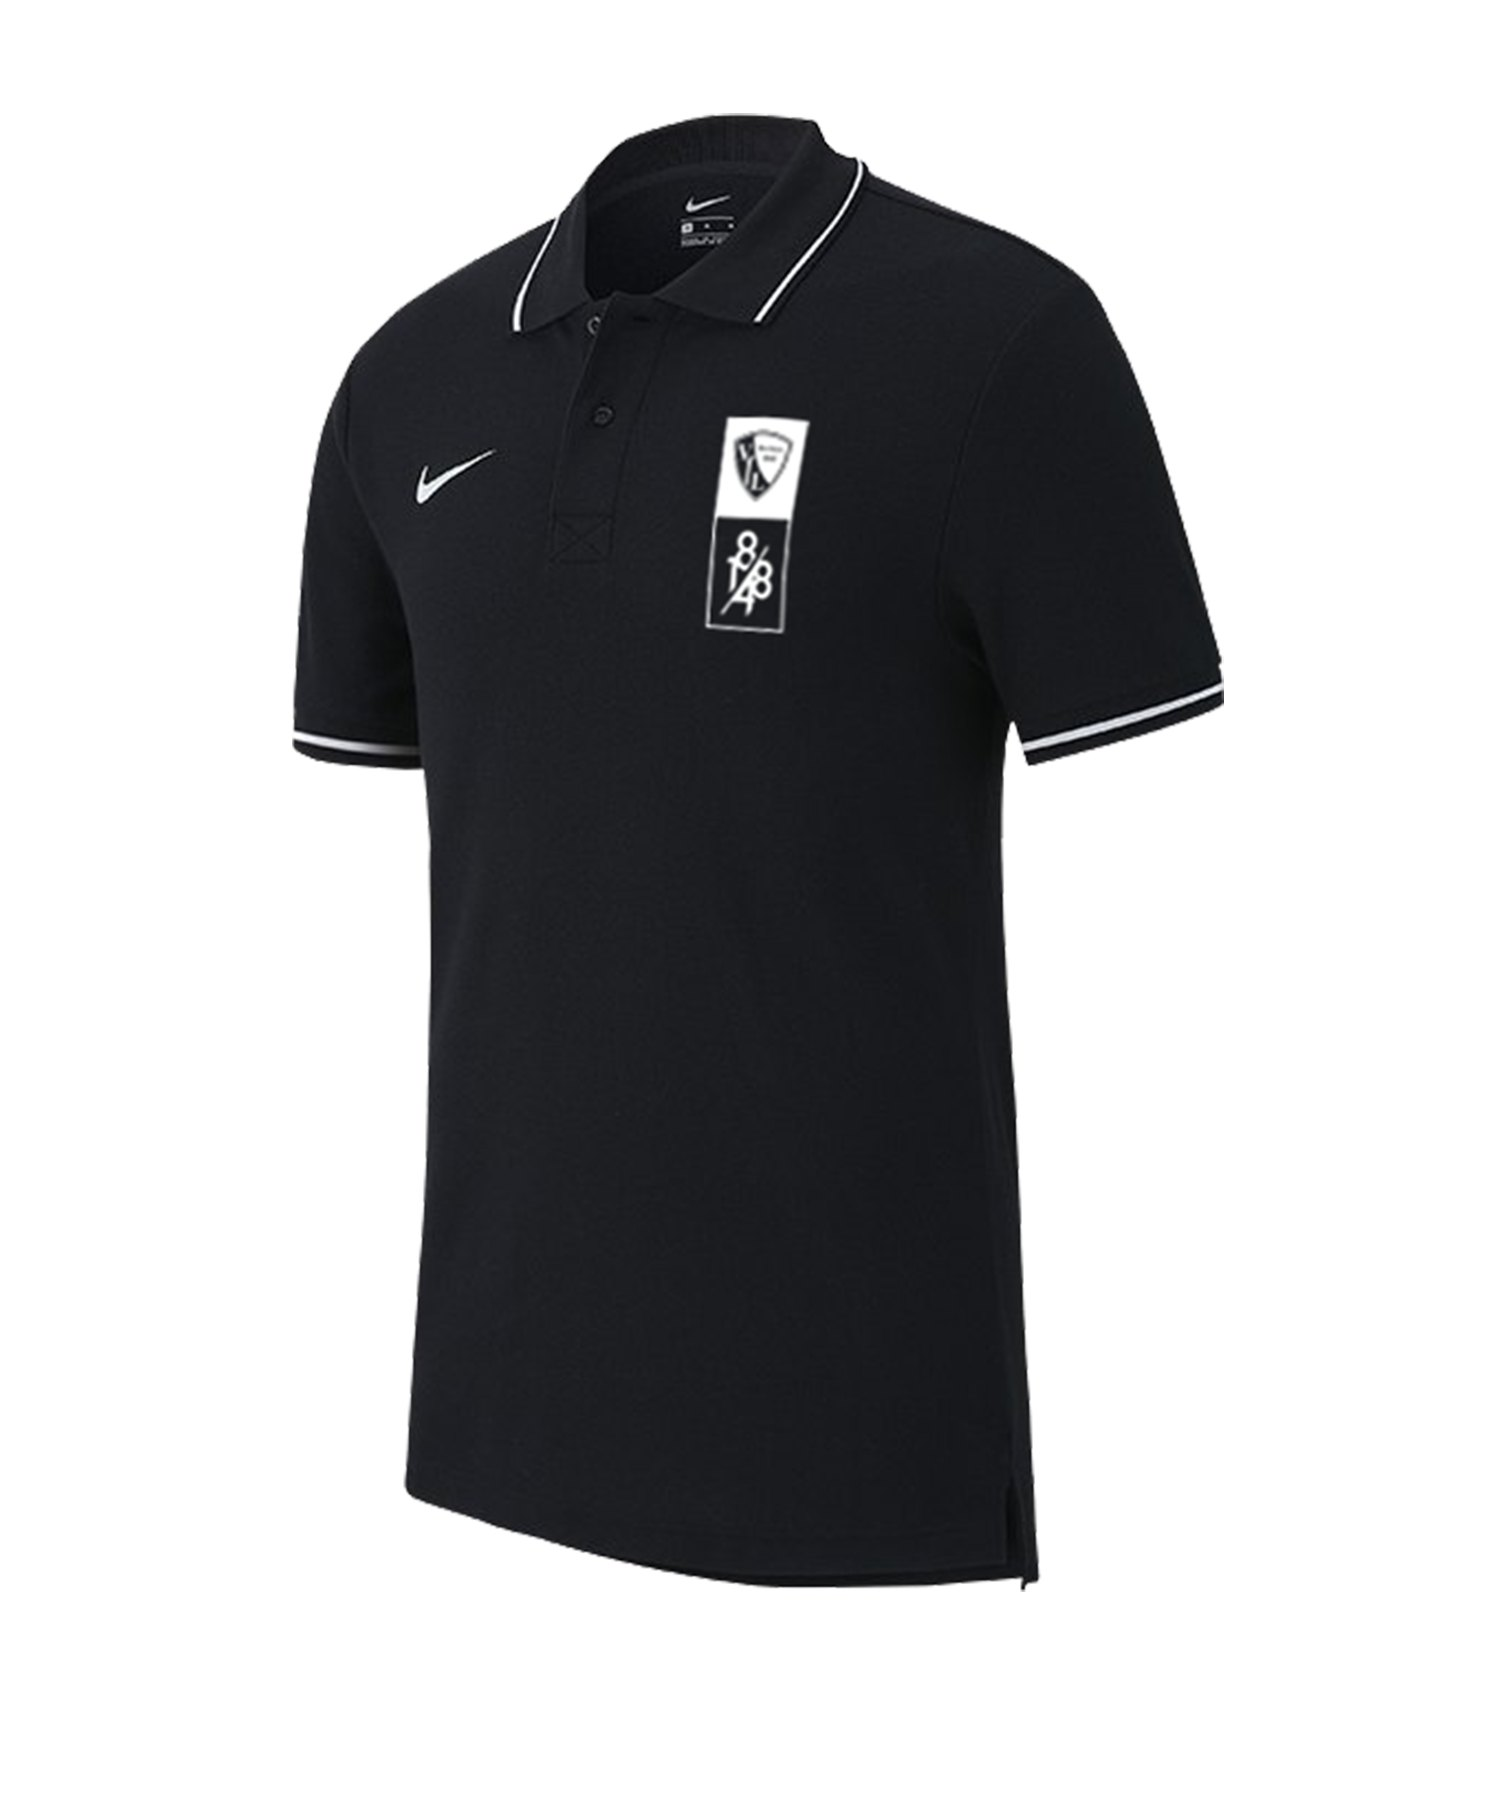 Nike VfL Bochum Poloshirt Schwarz F010 - schwarz